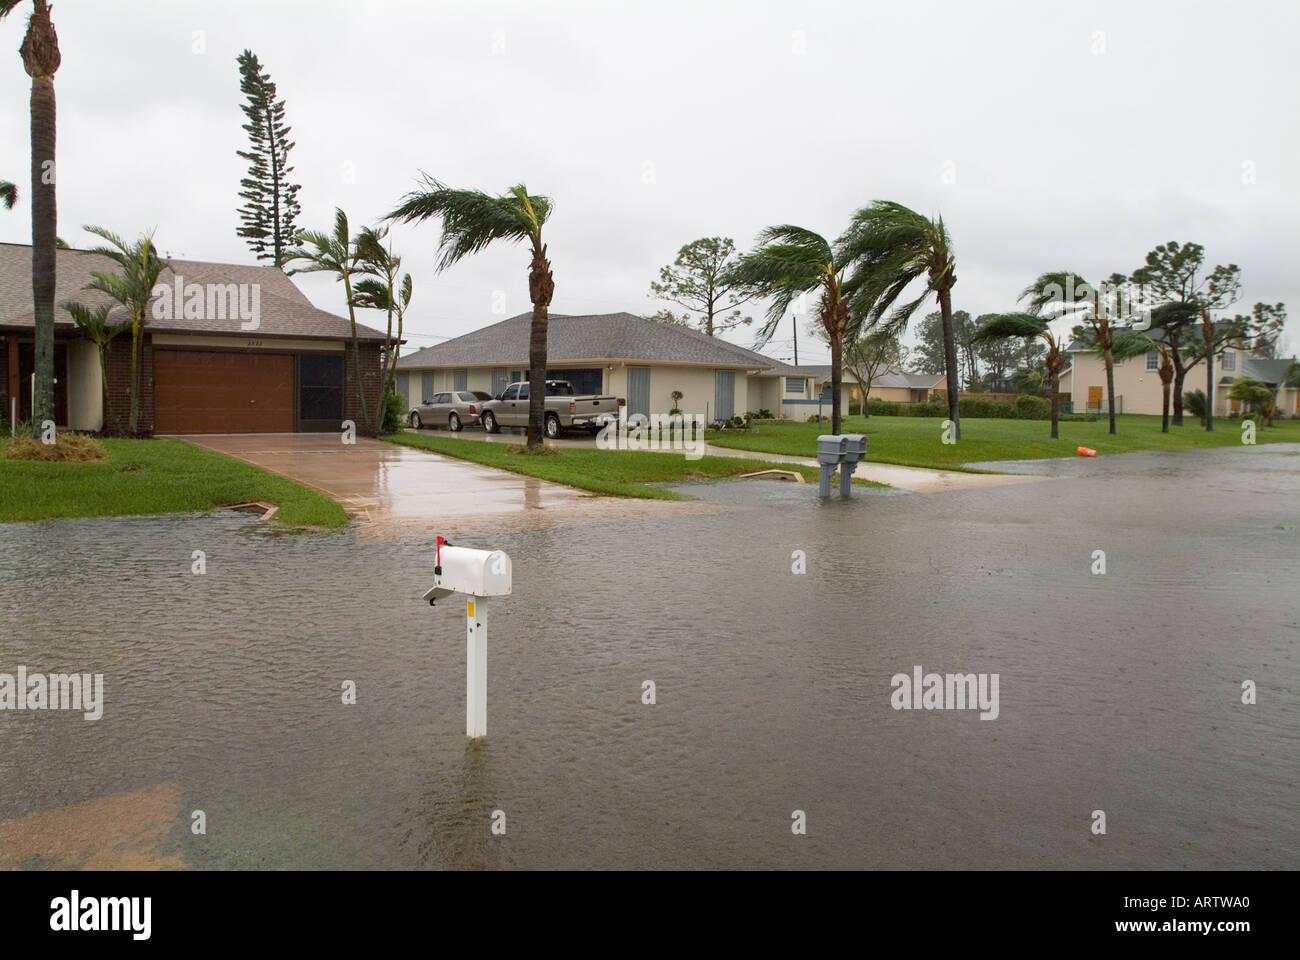 Hurrikan Wilma South Florida Sturm Port5 Saint Lucie Hurrikane Straße Hochwasser 10 24 05 Stockbild